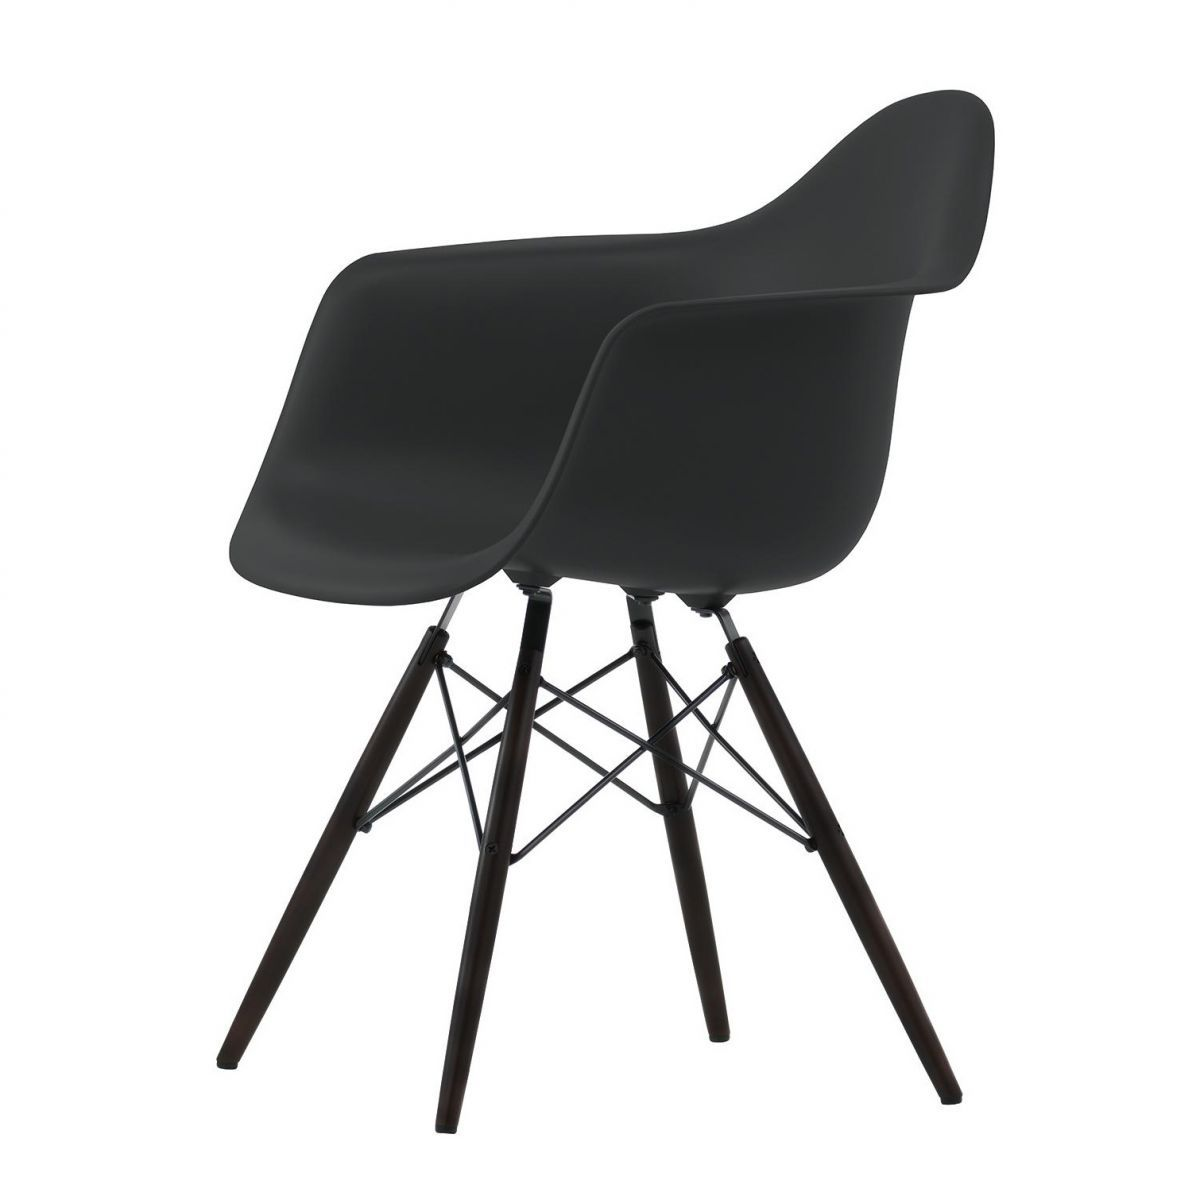 Eames Plastic Armchair DAW Maple Black Vitra Stoelen